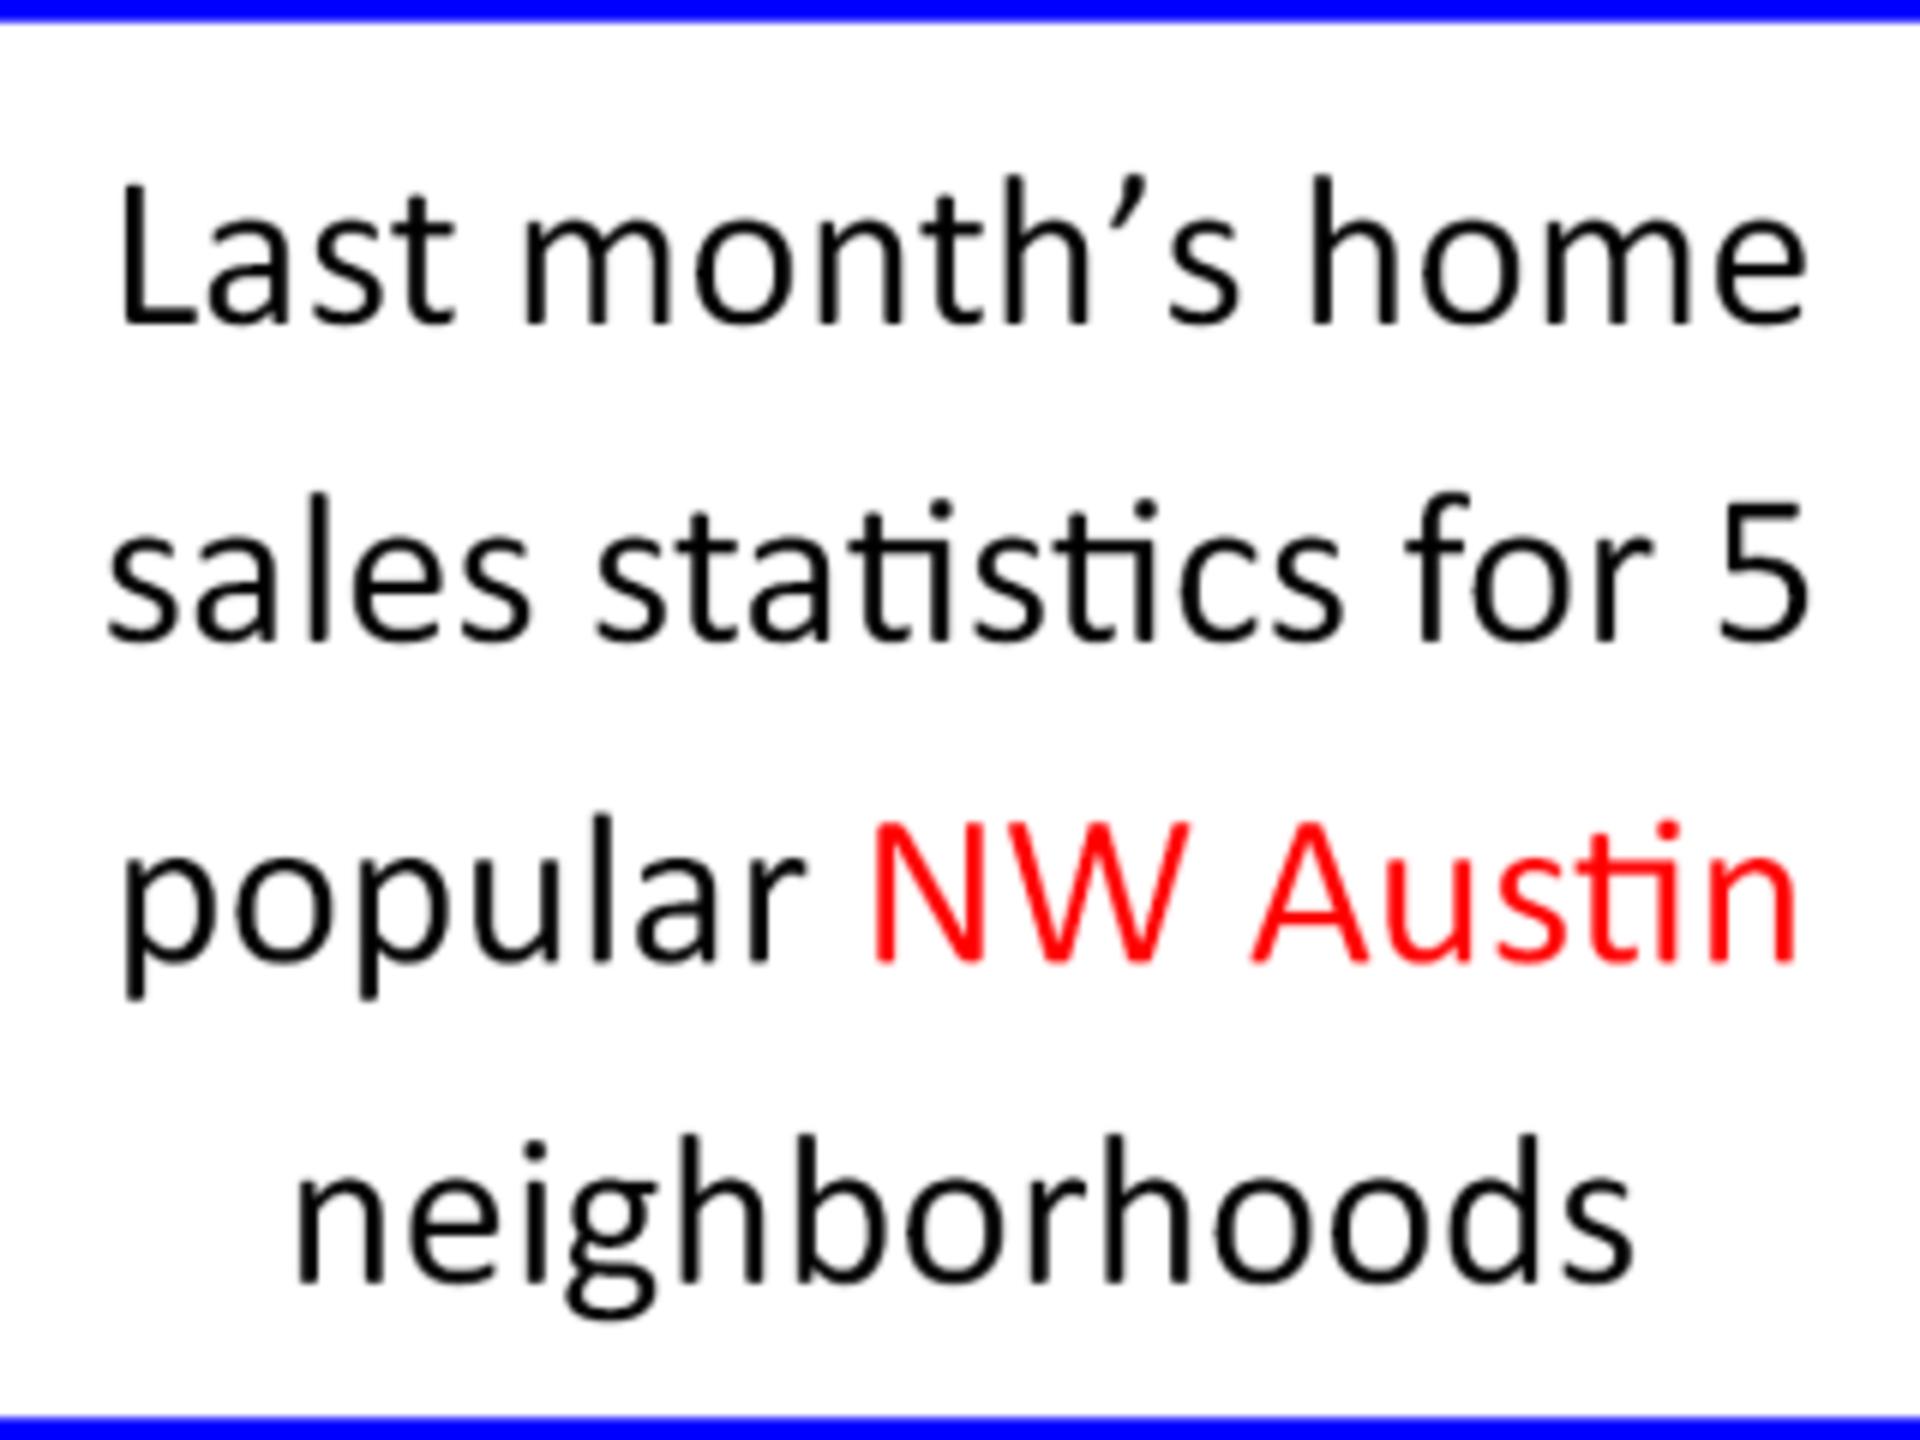 July home sales statistics for 5 popular NW Austin neighborhoods